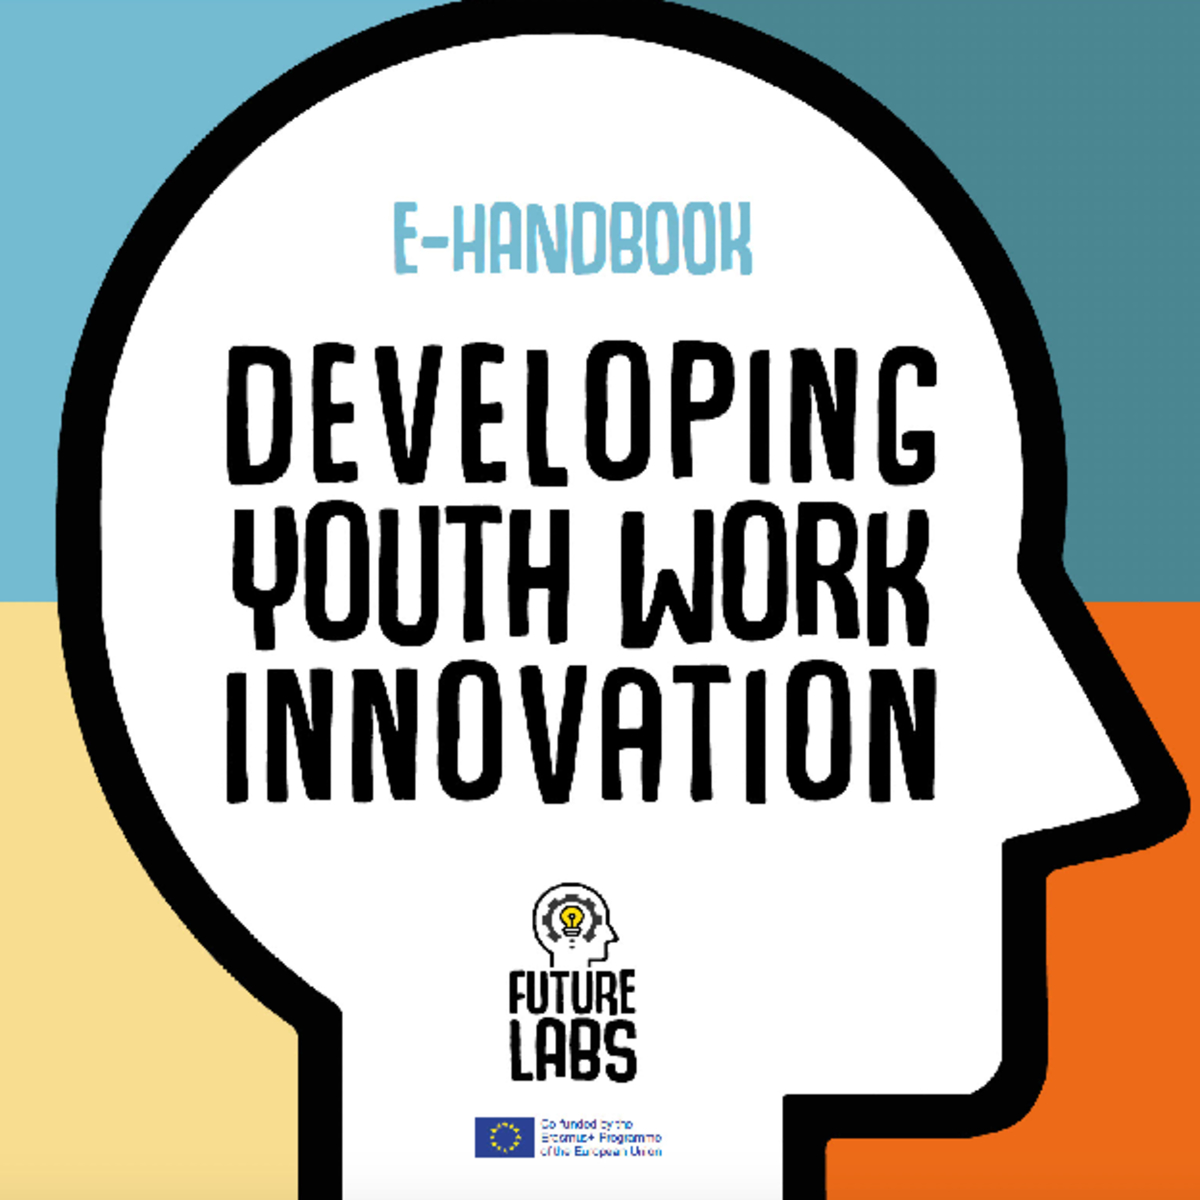 Developing Youth Work Innovation. E-handbook.